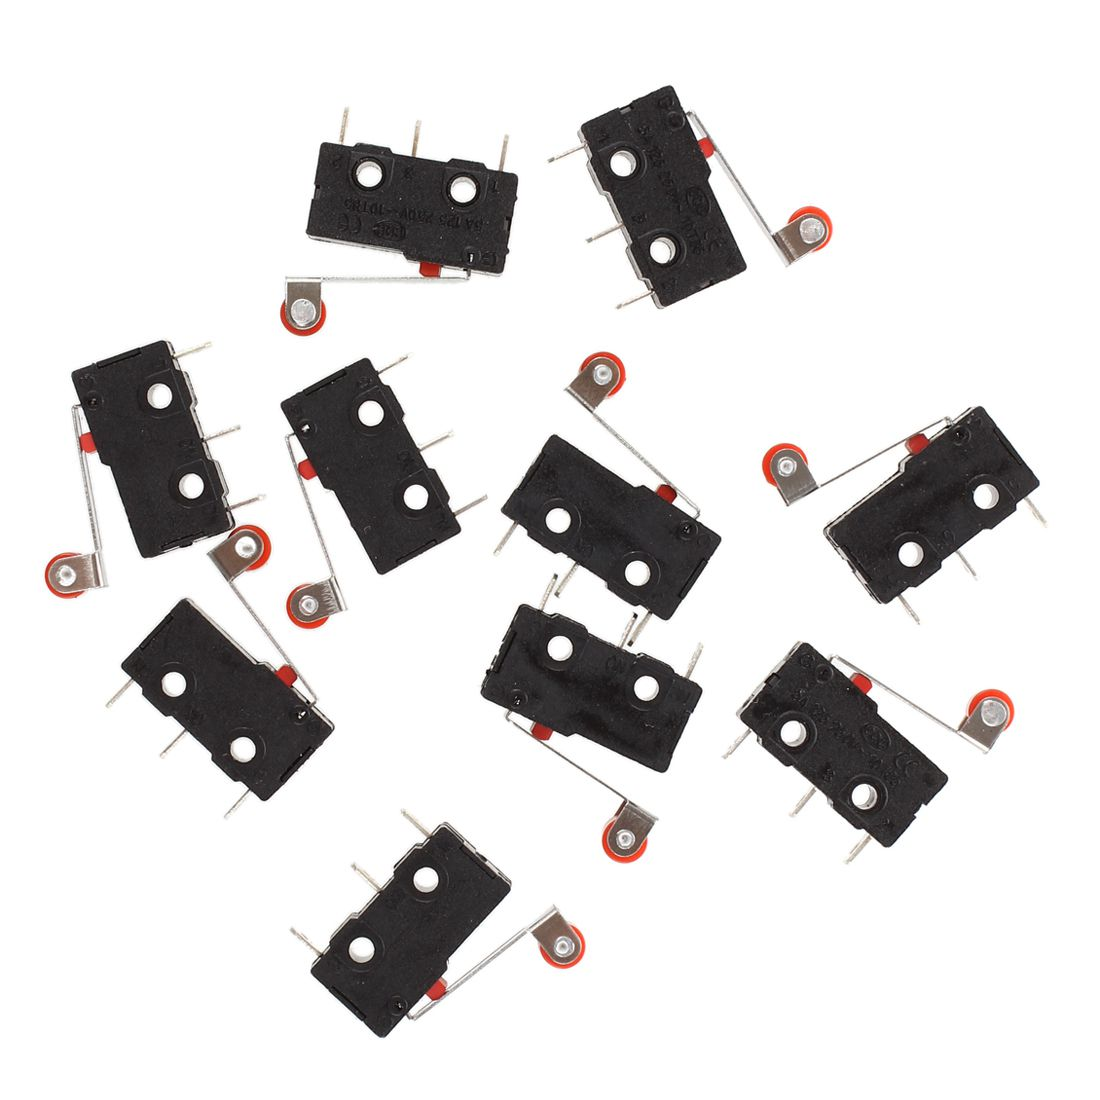 все цены на 10 Pcs Mini Micro Limit Switch Roller Lever Arm SPDT Snap Action LOT онлайн